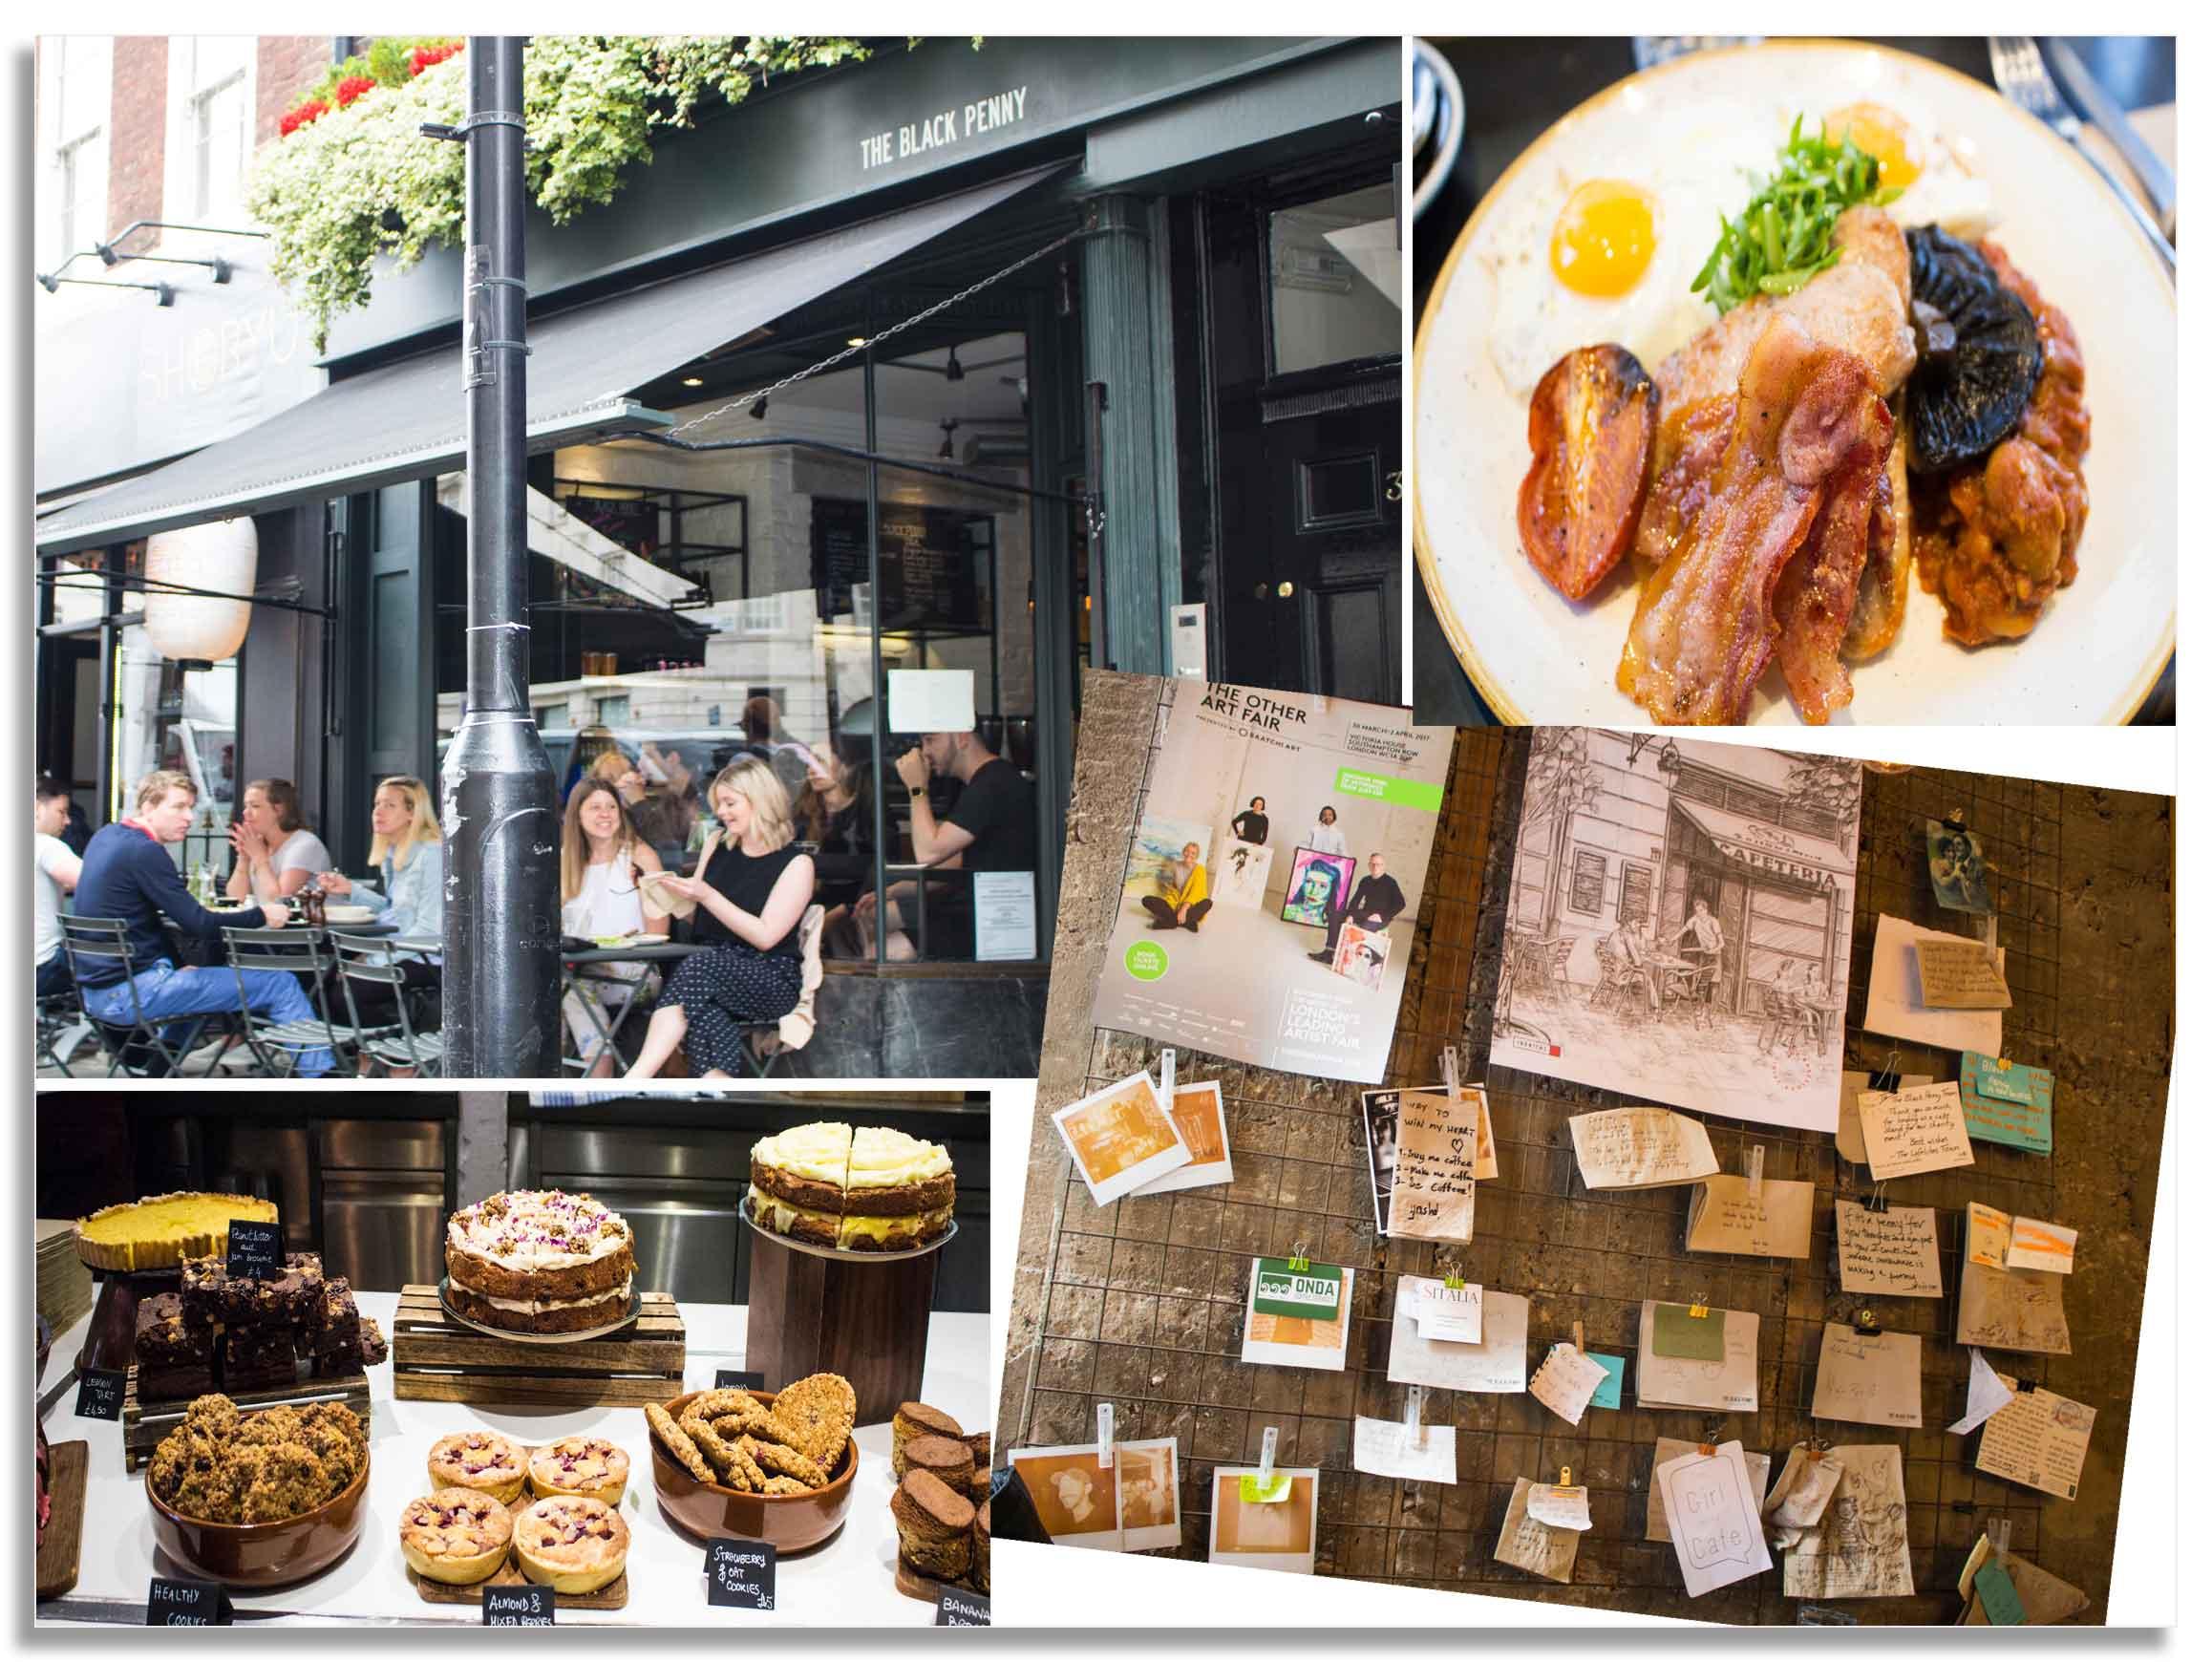 Black Penny Covent Garden London|foodandjourneys.net